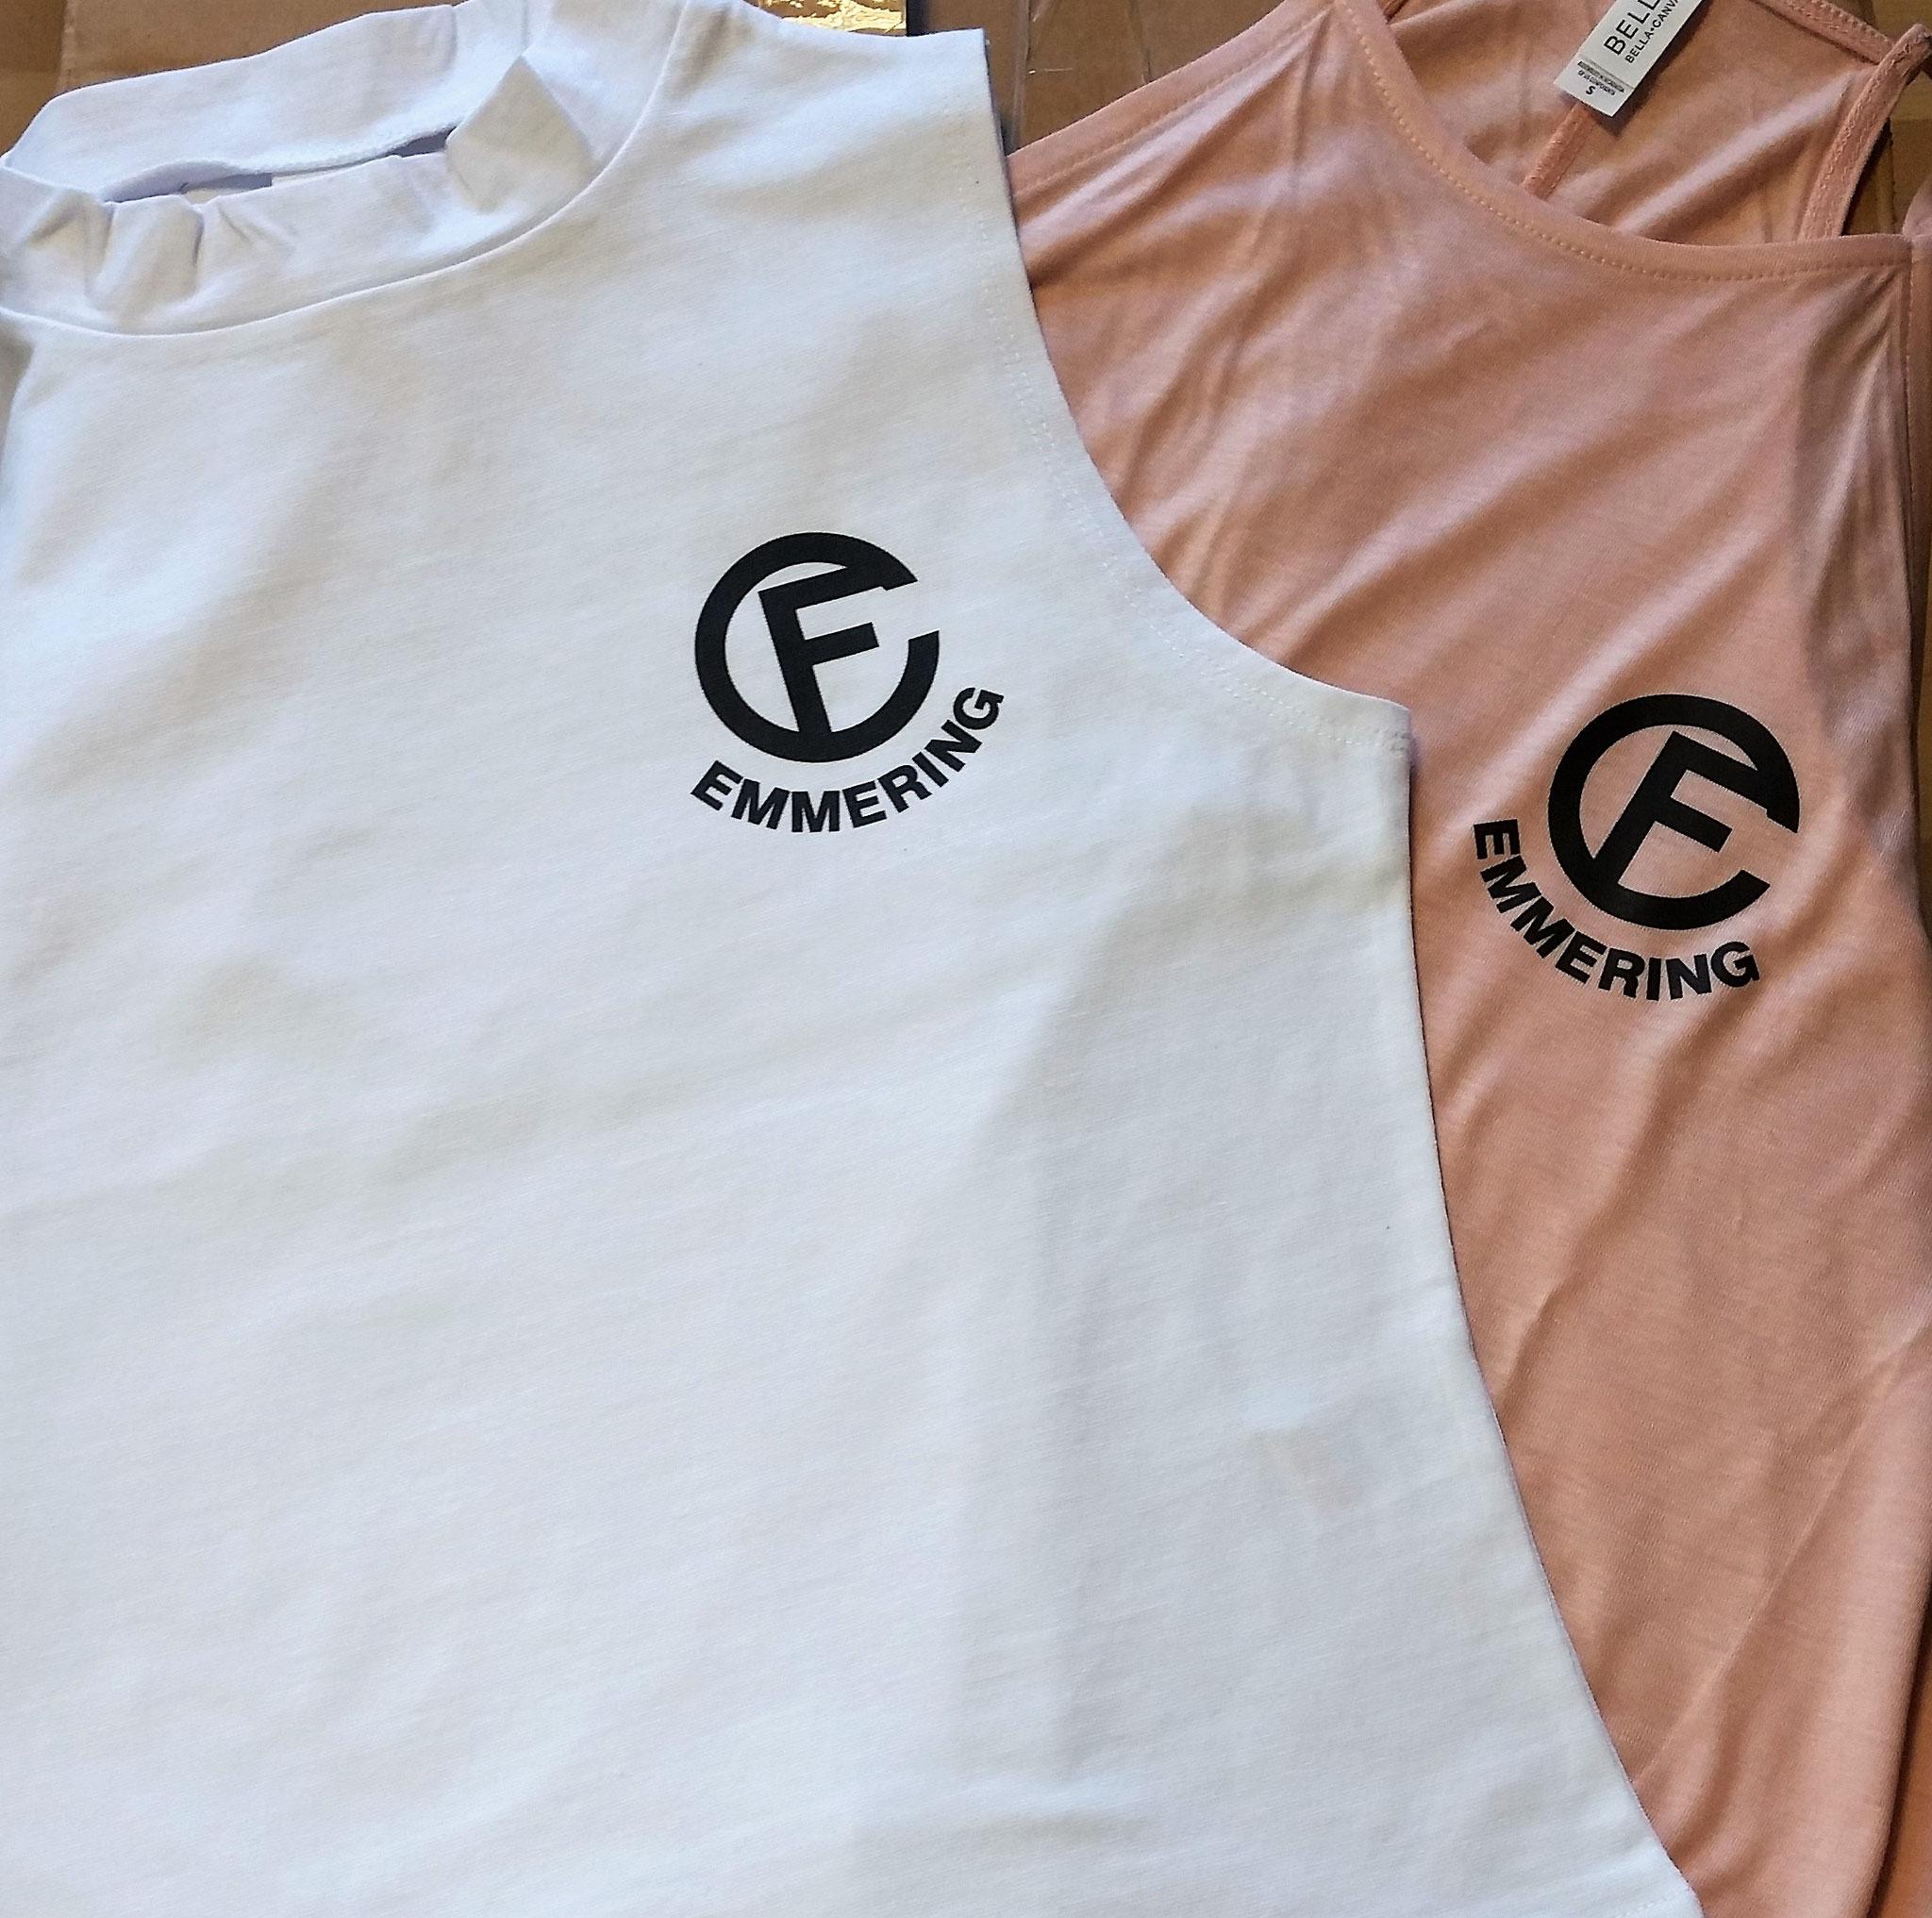 T-Shirt Transferdruck 1-farbig